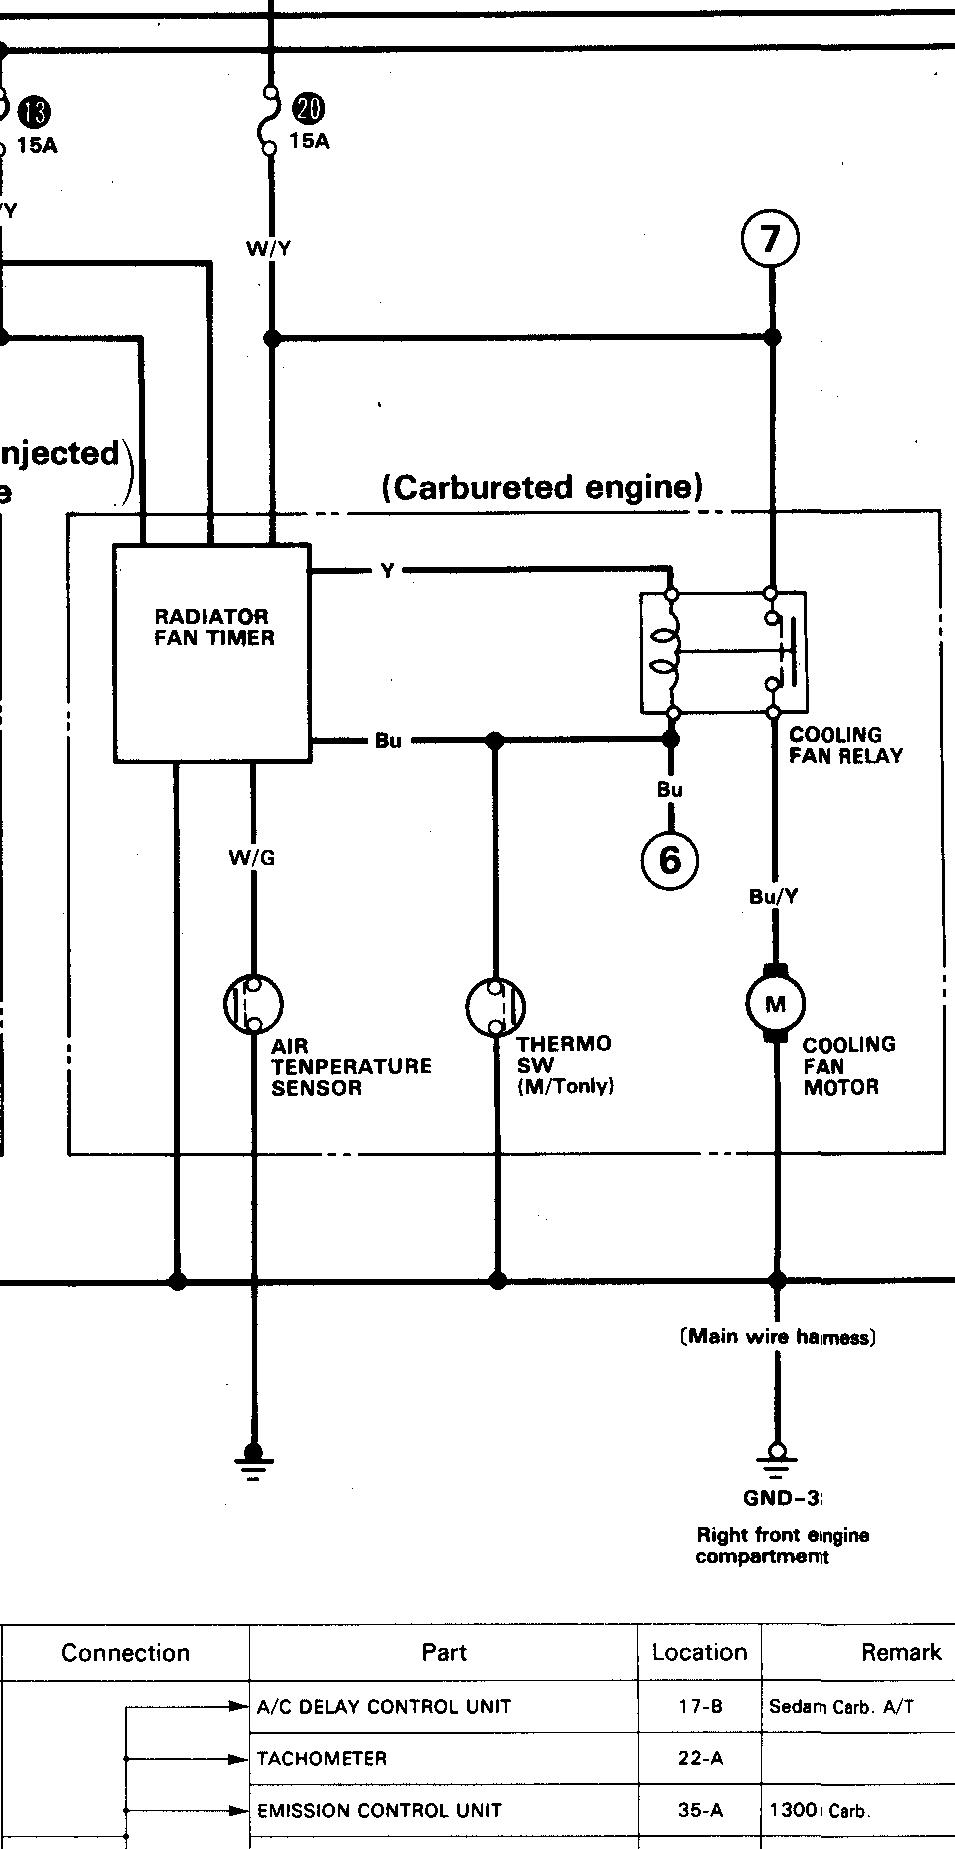 Click image for larger version  Name:Temp Sensor Circuit.png Views:137 Size:74.3 KB ID:1482